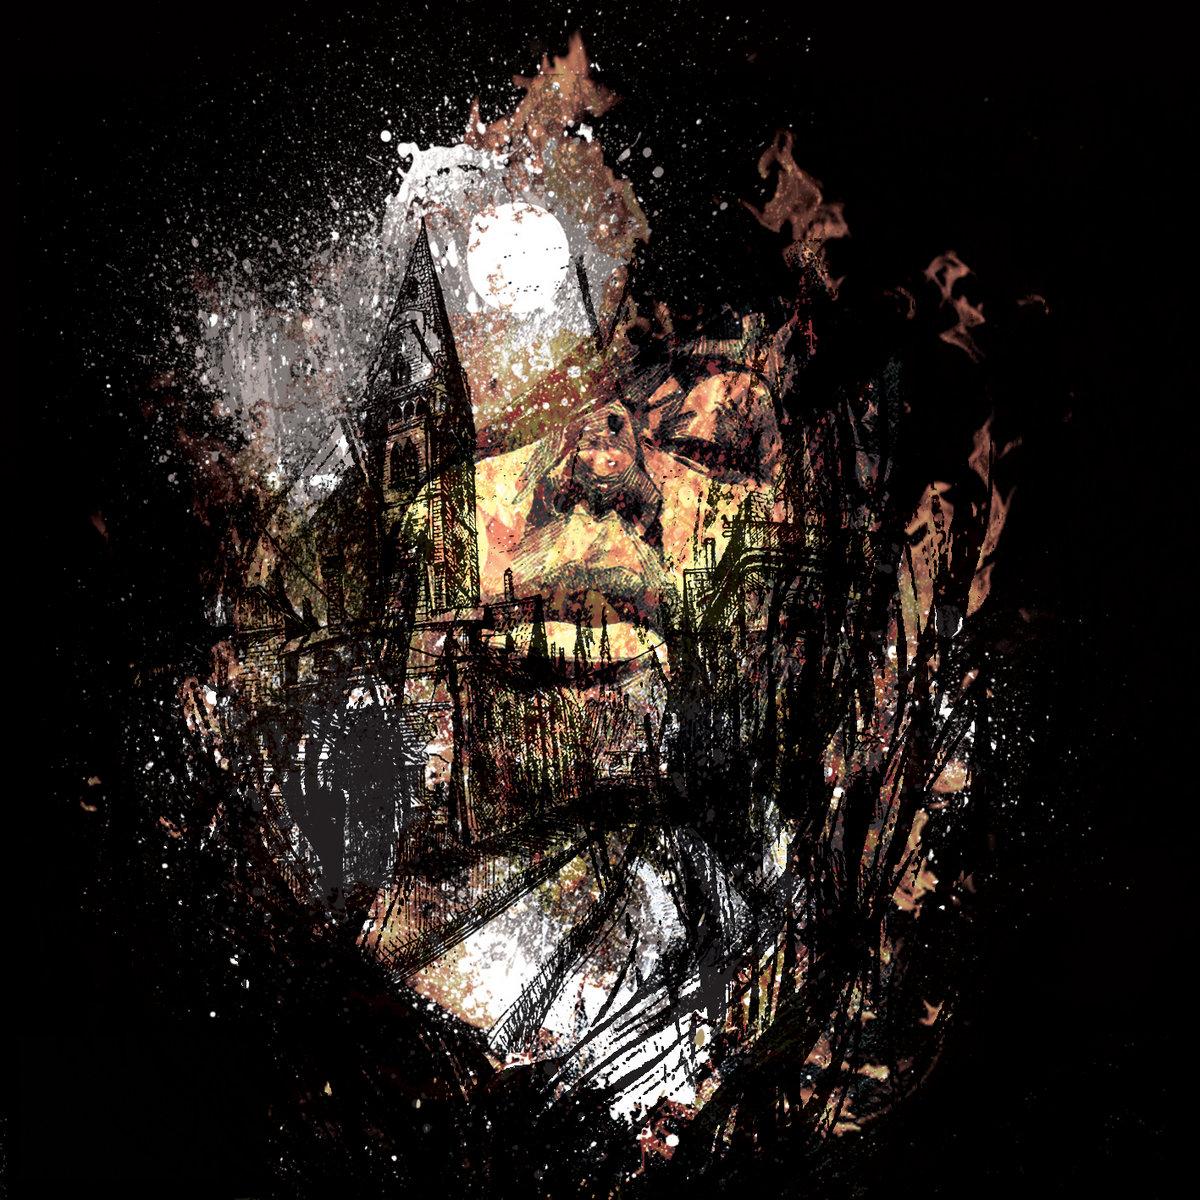 embercore album